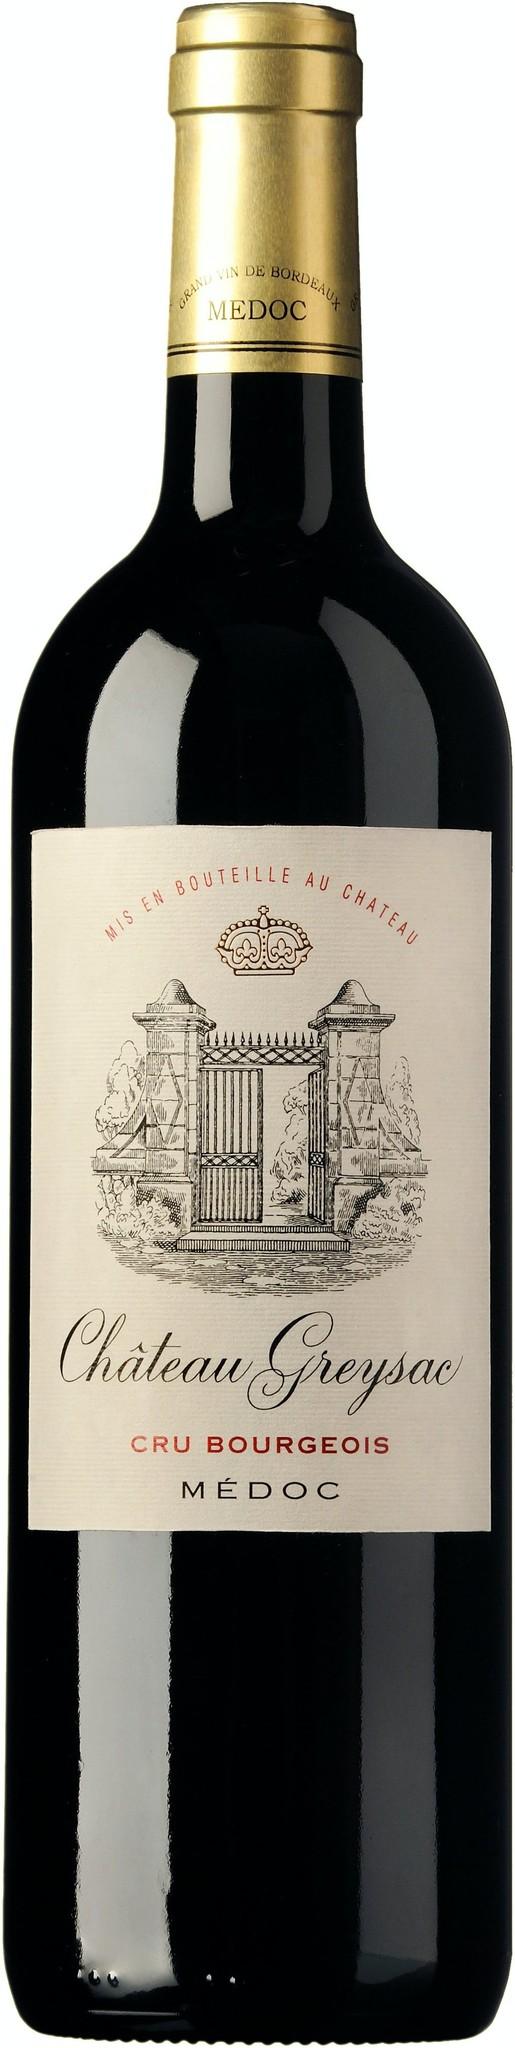 Chateau Greysac Medoc Cru Bourgeois 2015 750ml